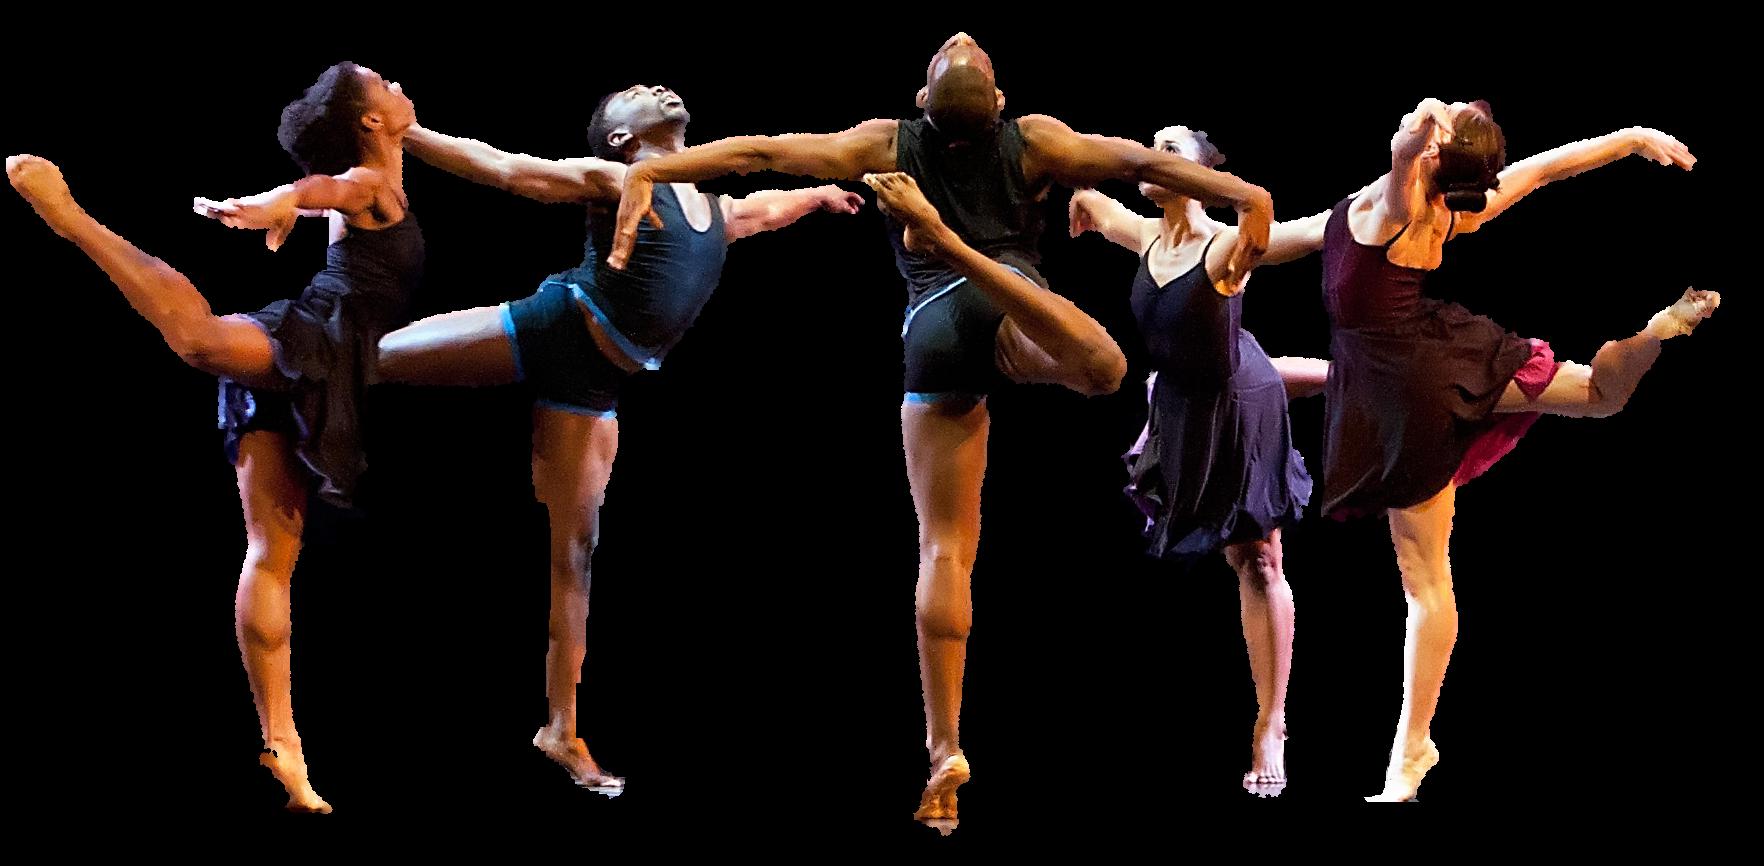 Png Dancers & Free Dancers.png Transparent Images #11226.